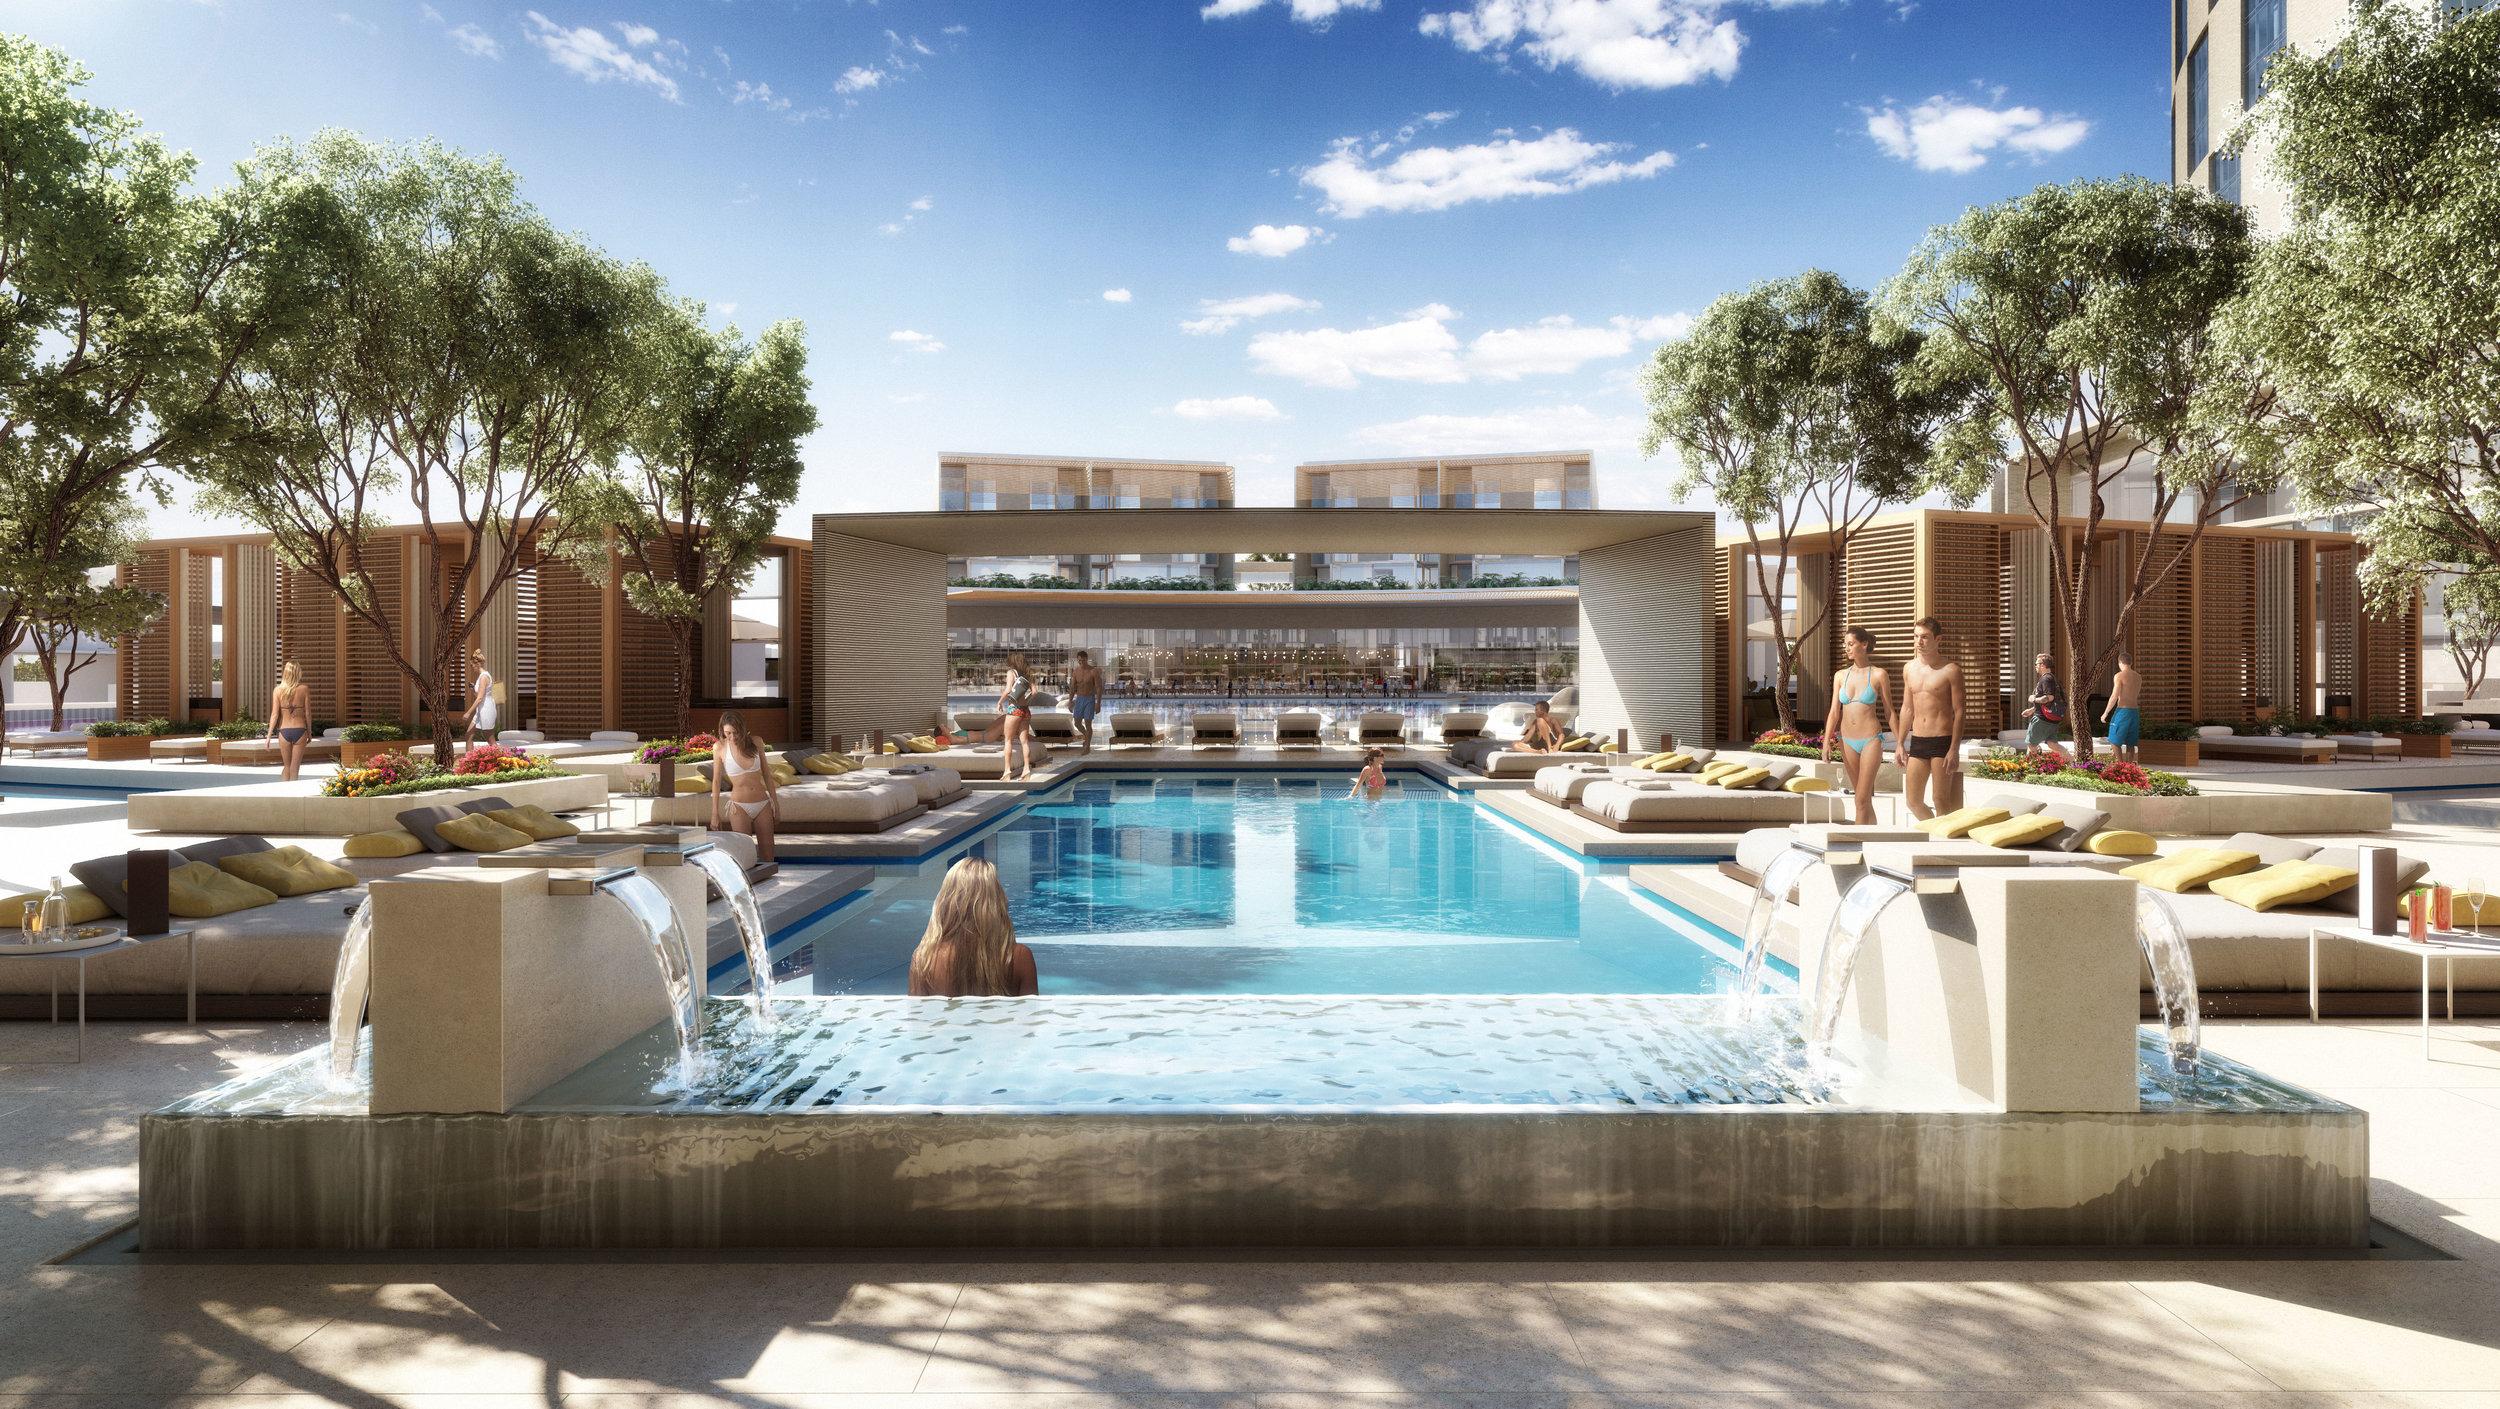 DBOX_AD_Las Vegas_VIP Pool- revised.jpg